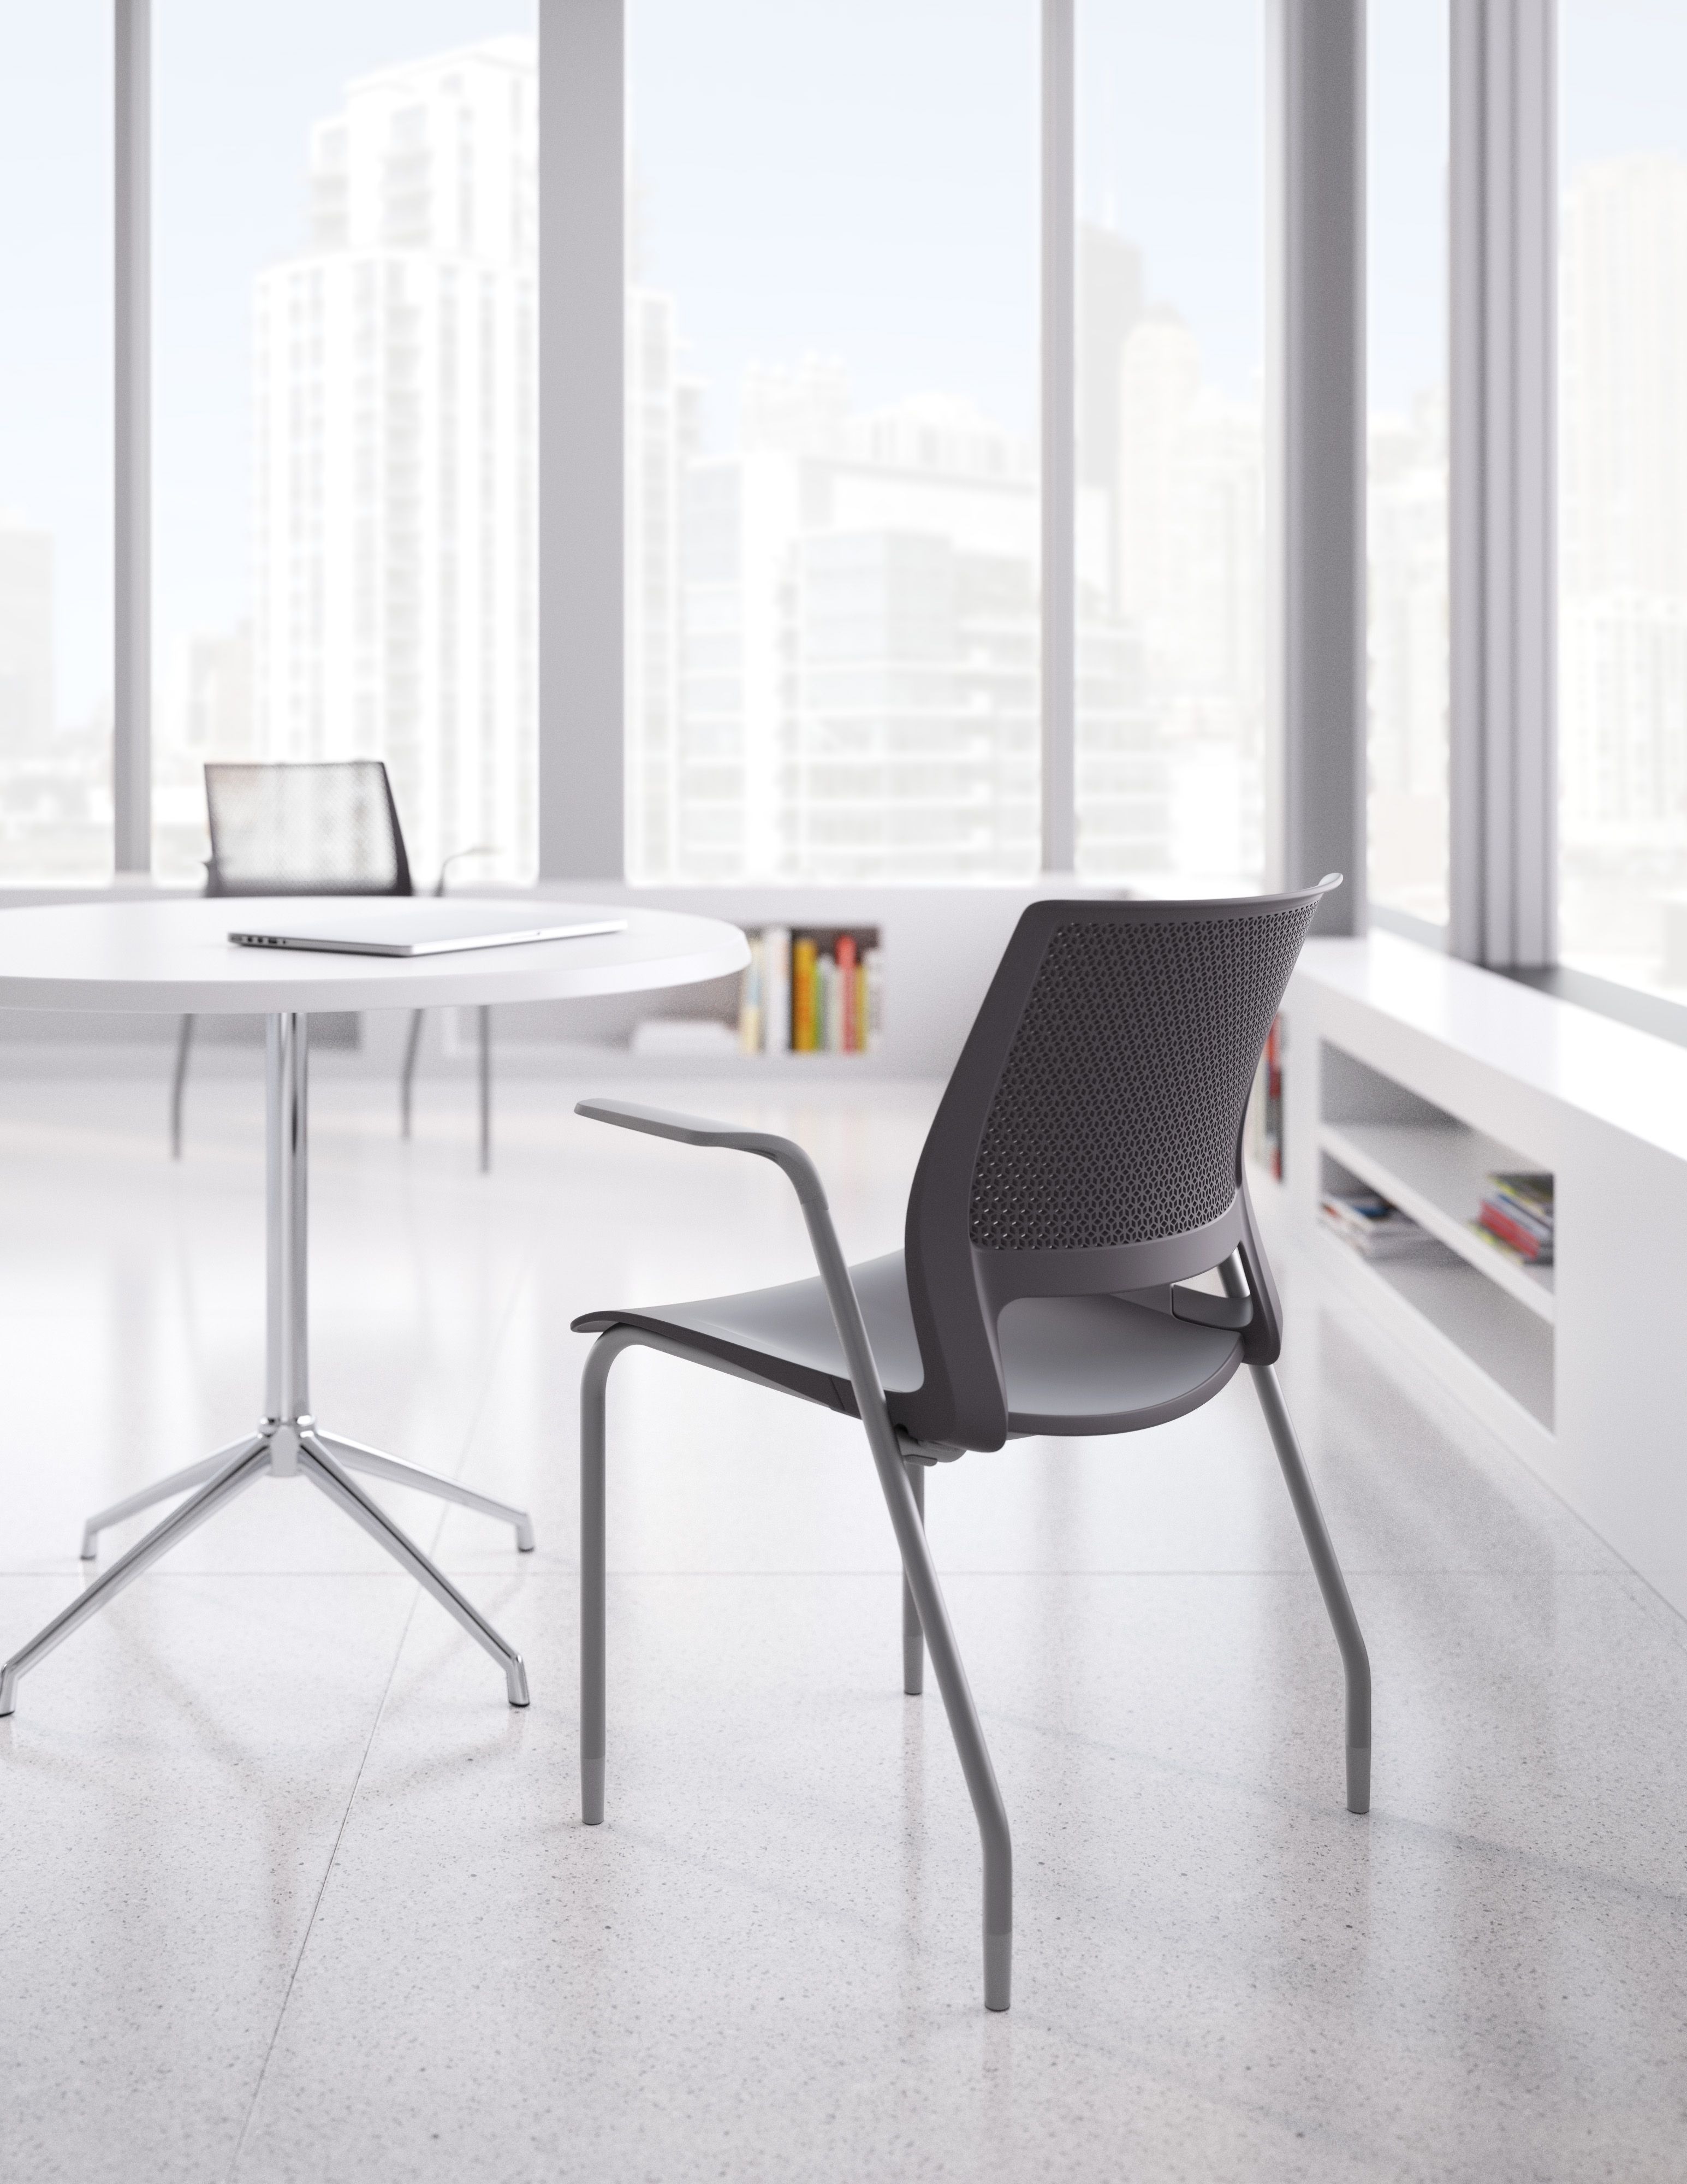 SOI Lumin NEOCON2015 (With images) Ergonomic chair